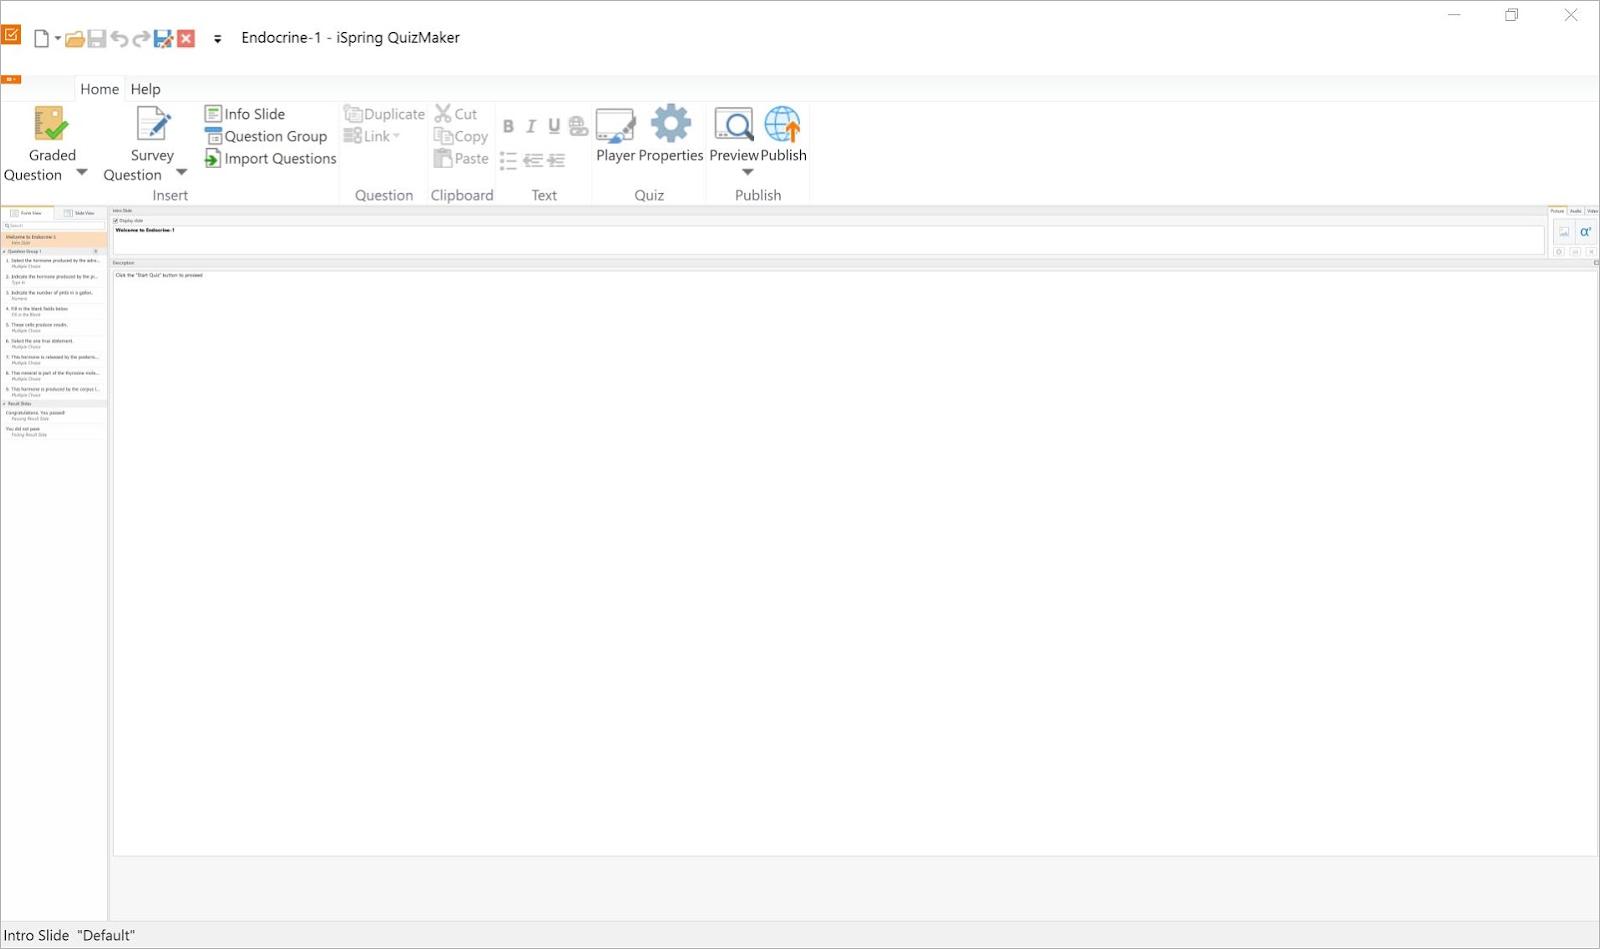 How to Fix Windows Program Appearance on HiDPI Screens